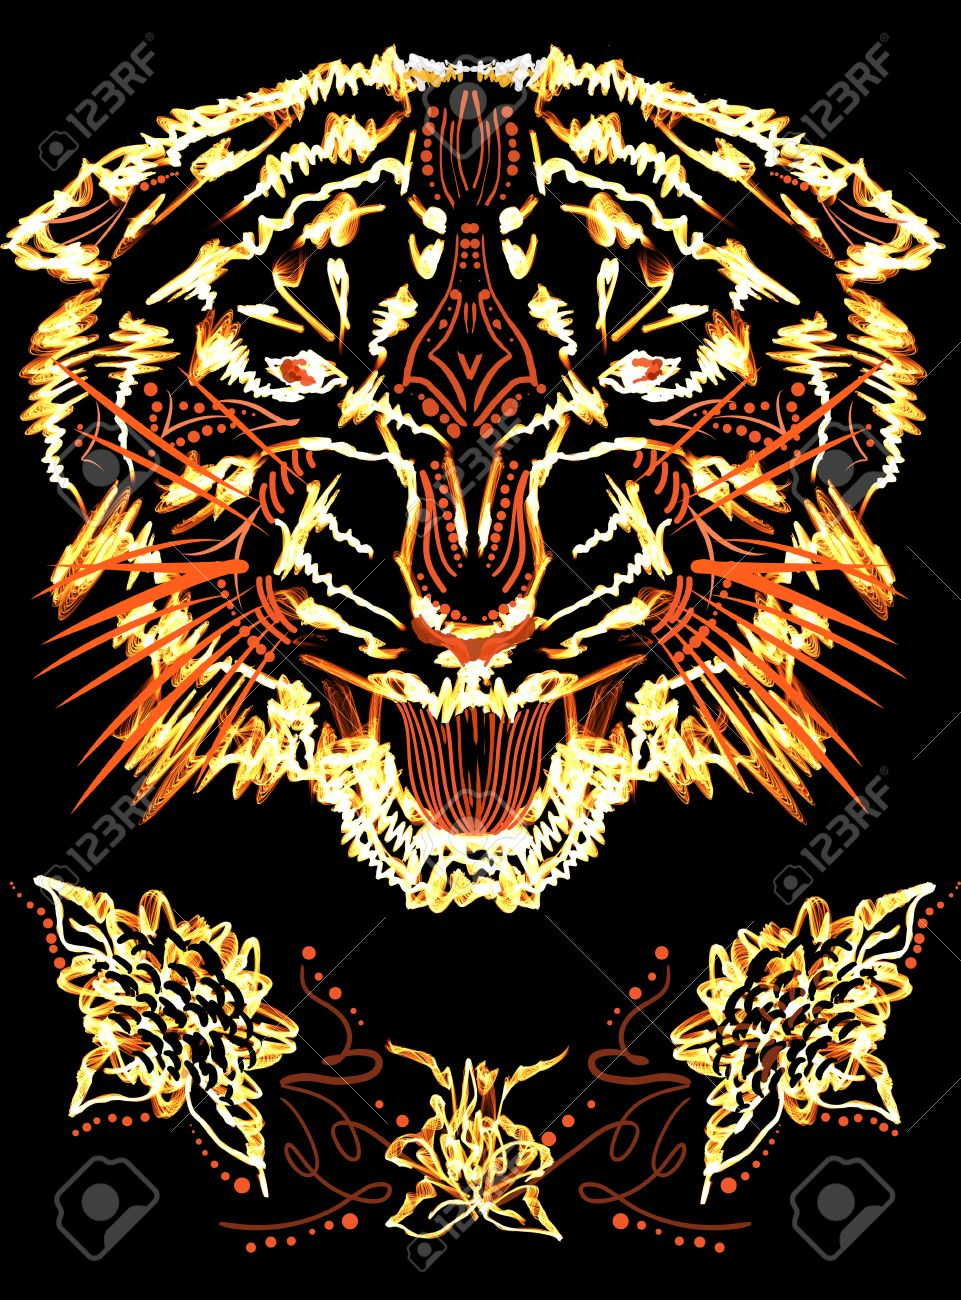 Design t shirt in photoshop - Grinning Flame Tiger Photoshop Illustration For T Shirt Design Stock Illustration 24524227